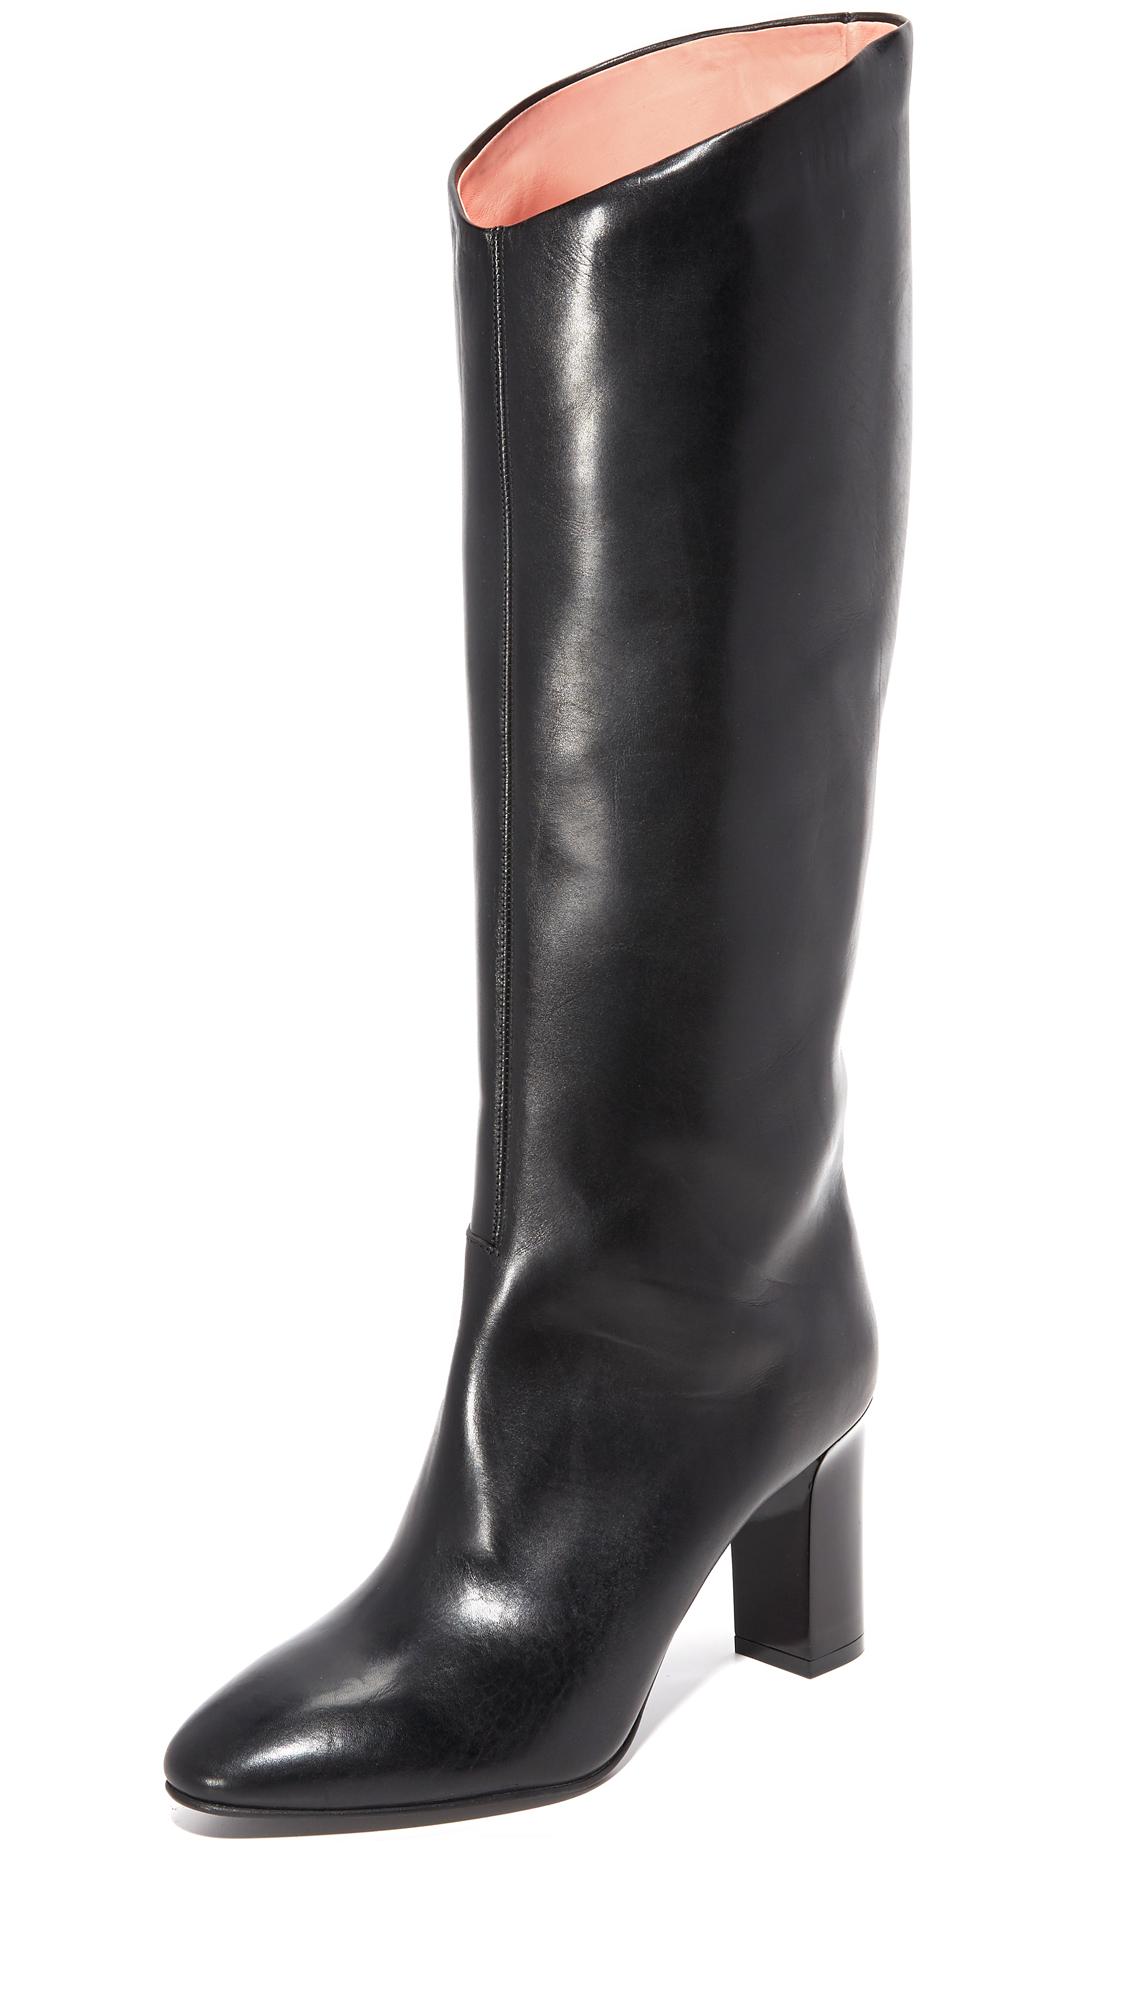 Acne Studios Aly V Boots - Black